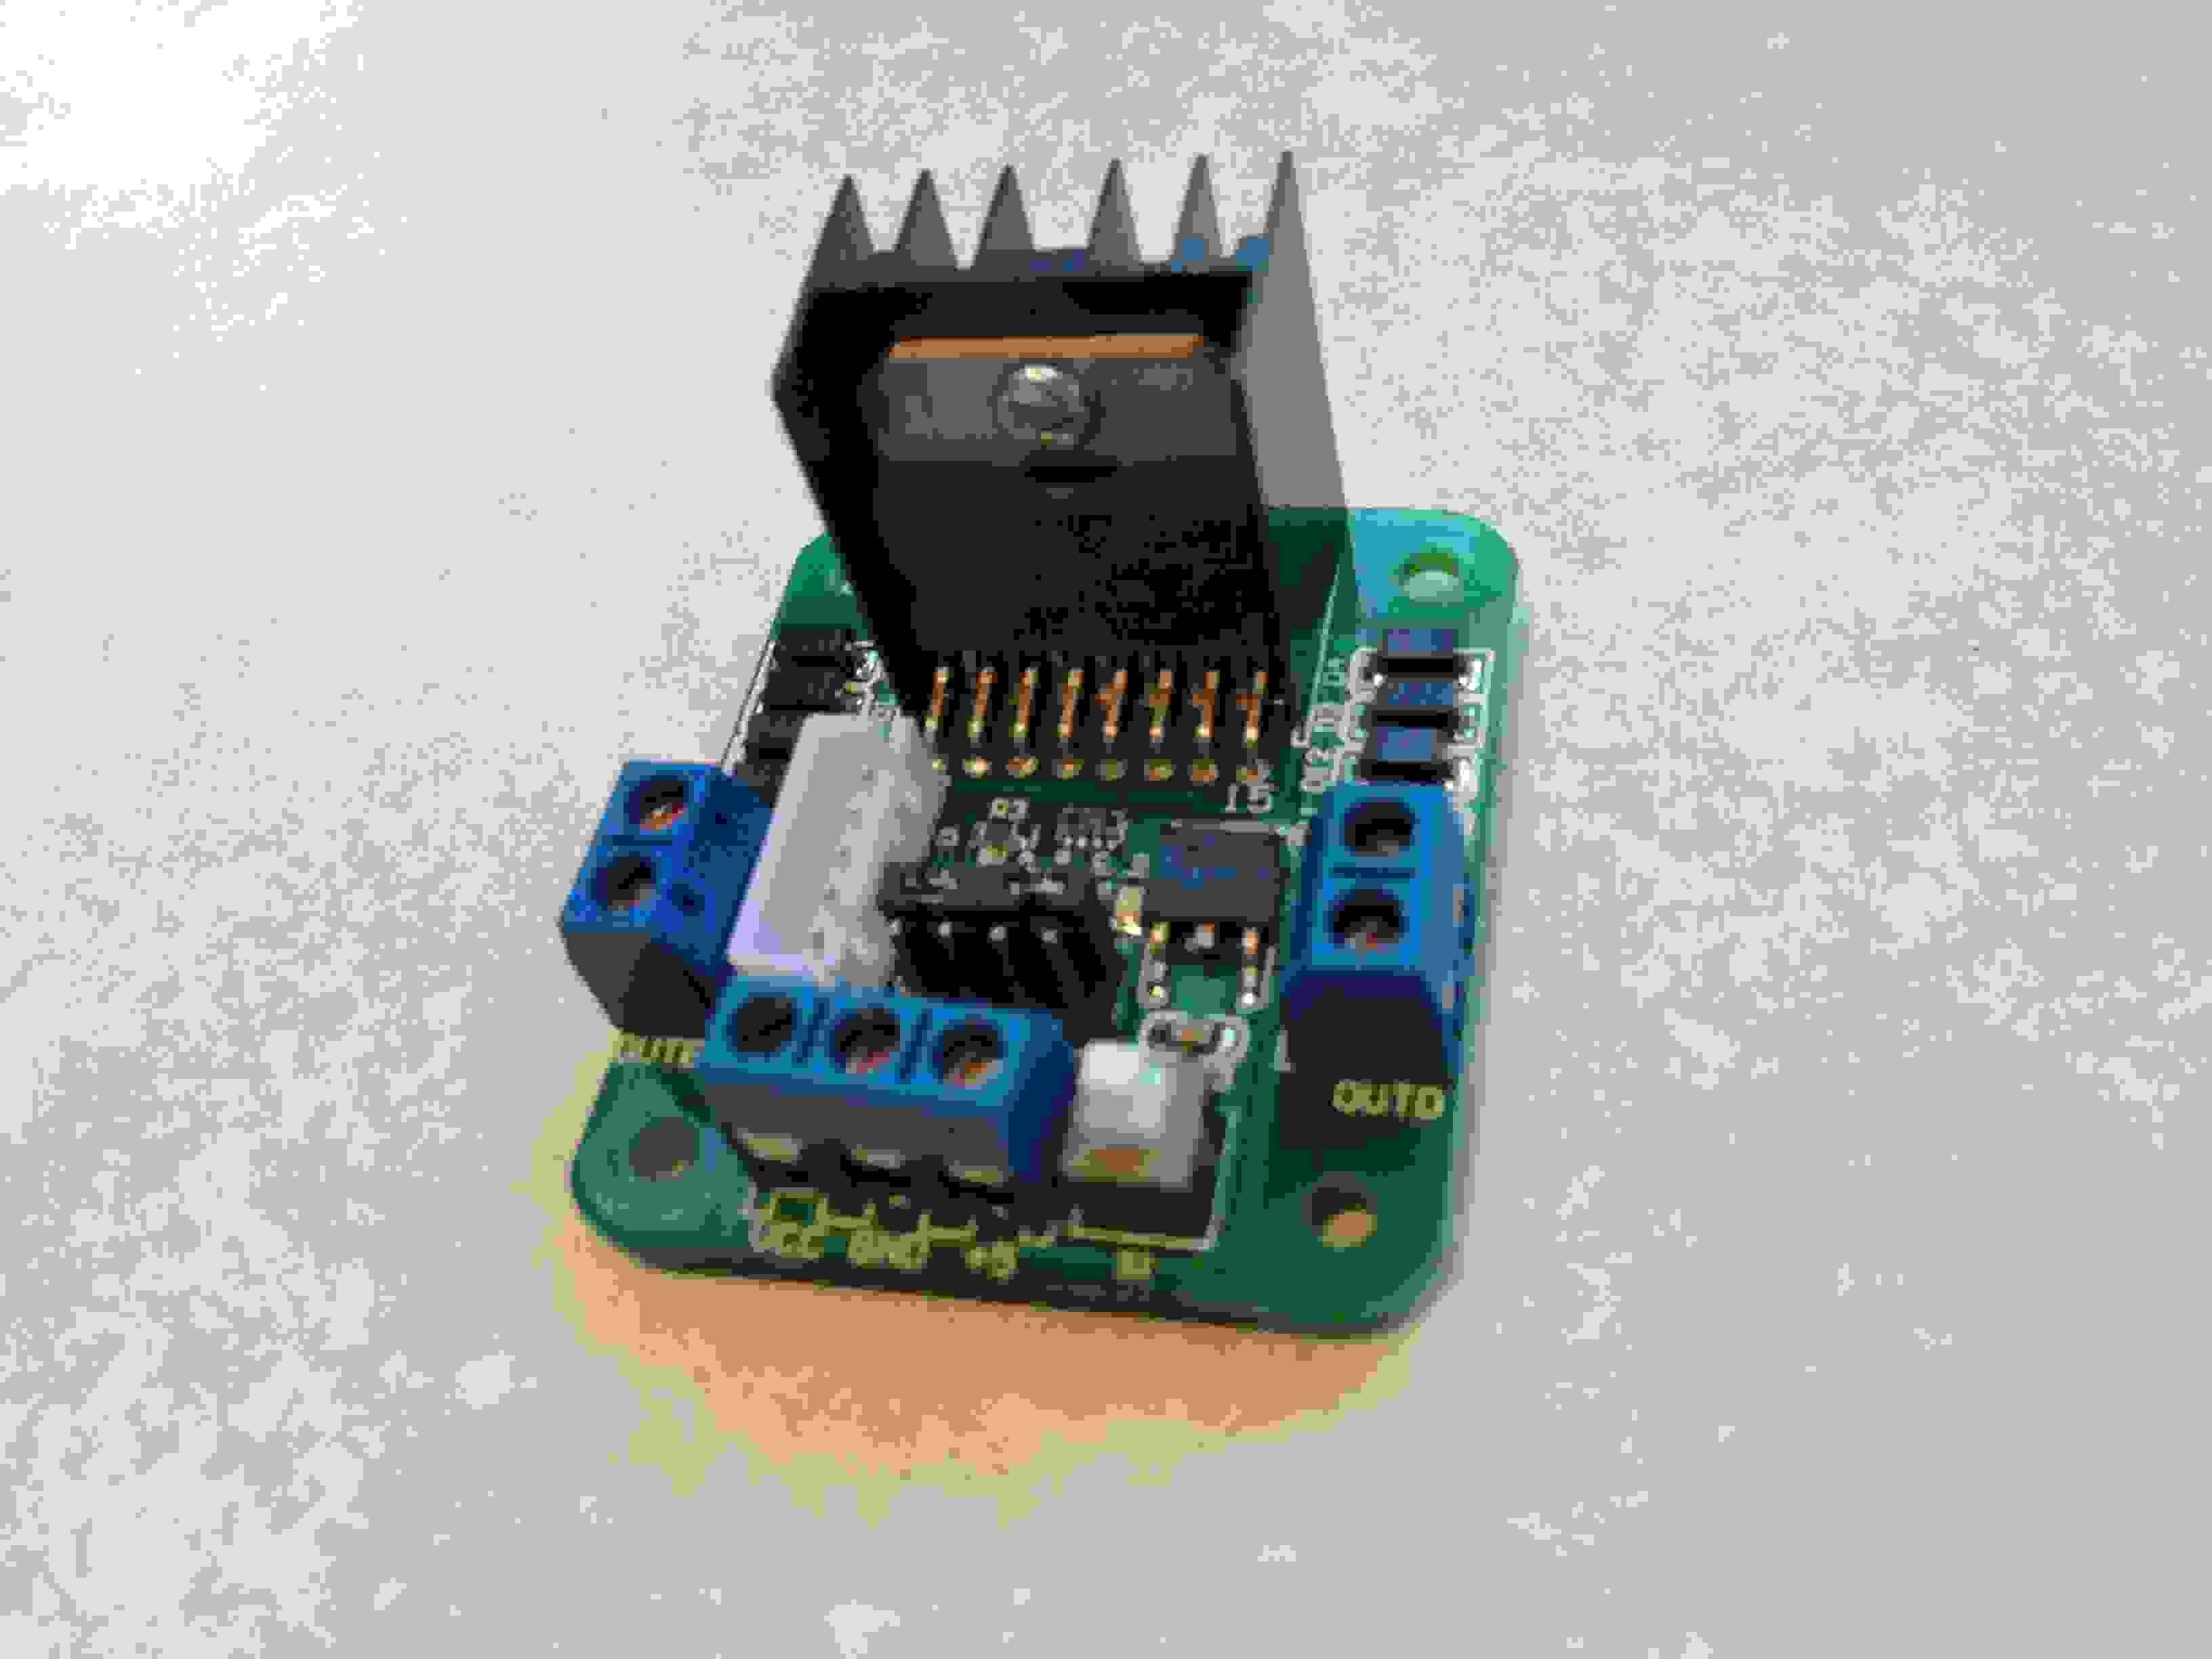 L298n Stepper Motor Controller Steppermotorcontroller